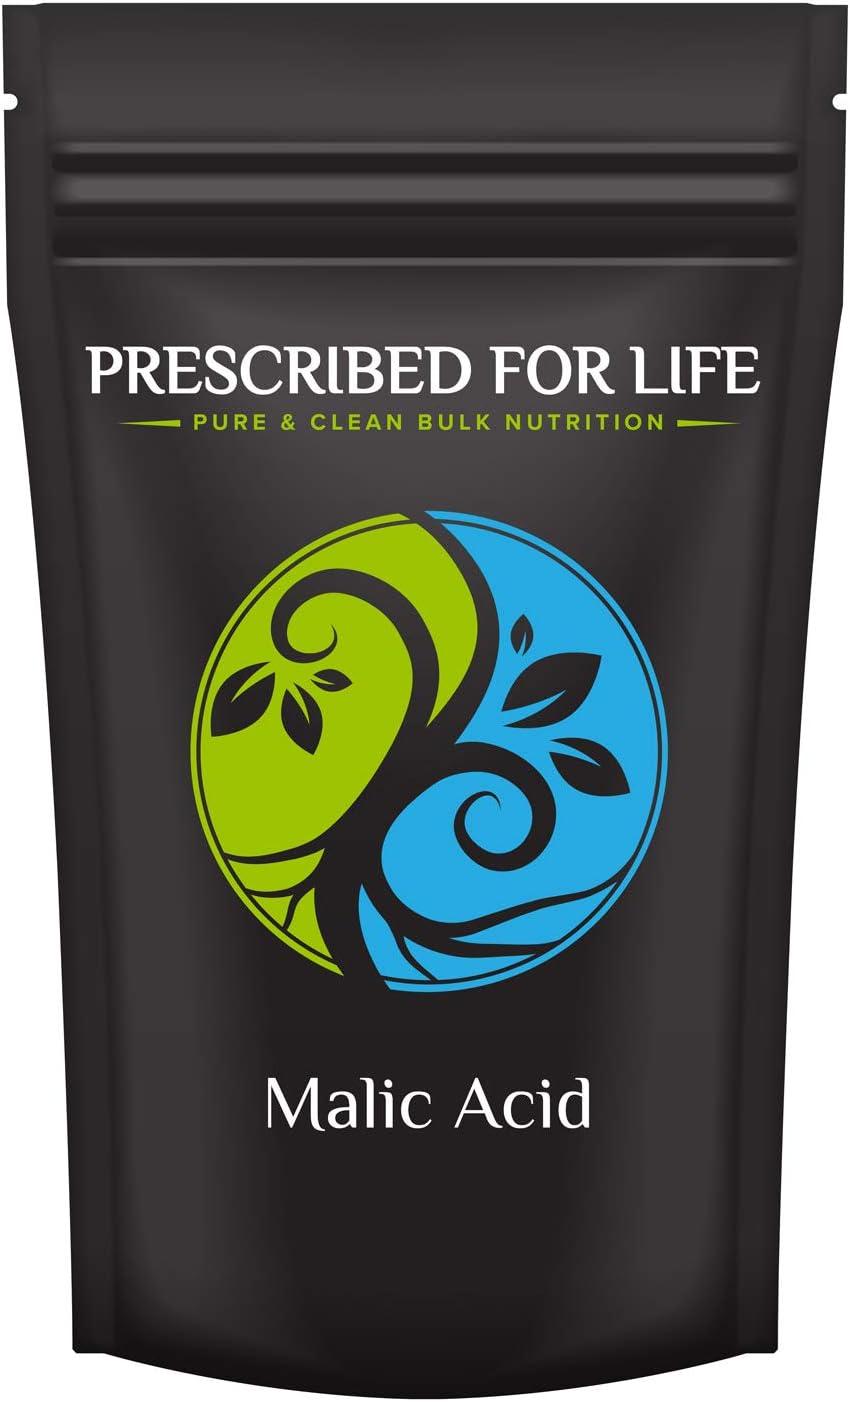 Prescribed for Life Malic Acid (DL) - USP Food Grade Granular (for Flavoring Use Only), 50 lb